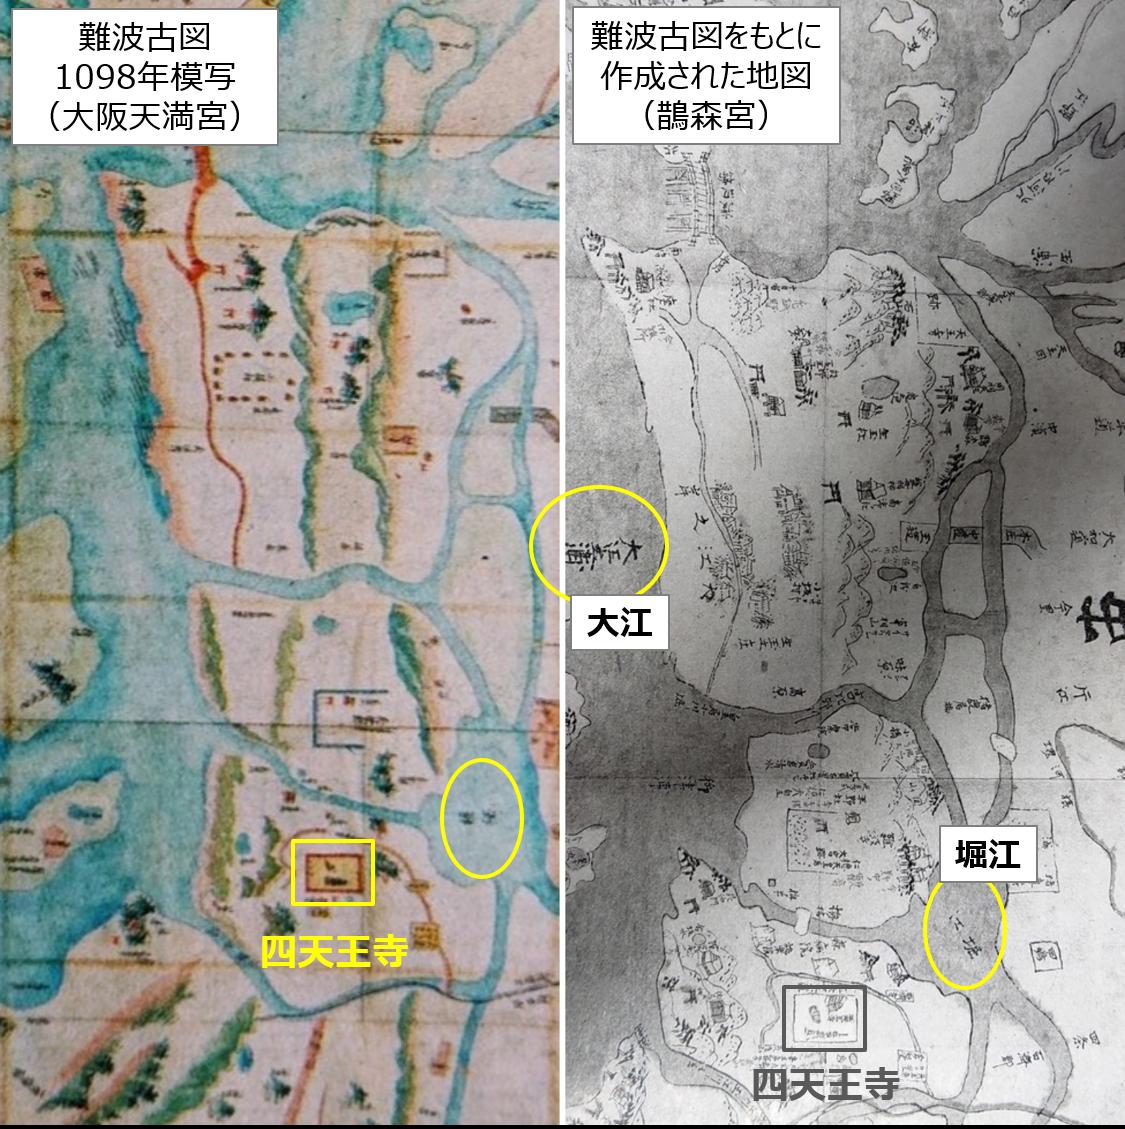 f:id:Kaimotu_Hatuji:20200602110309p:plain